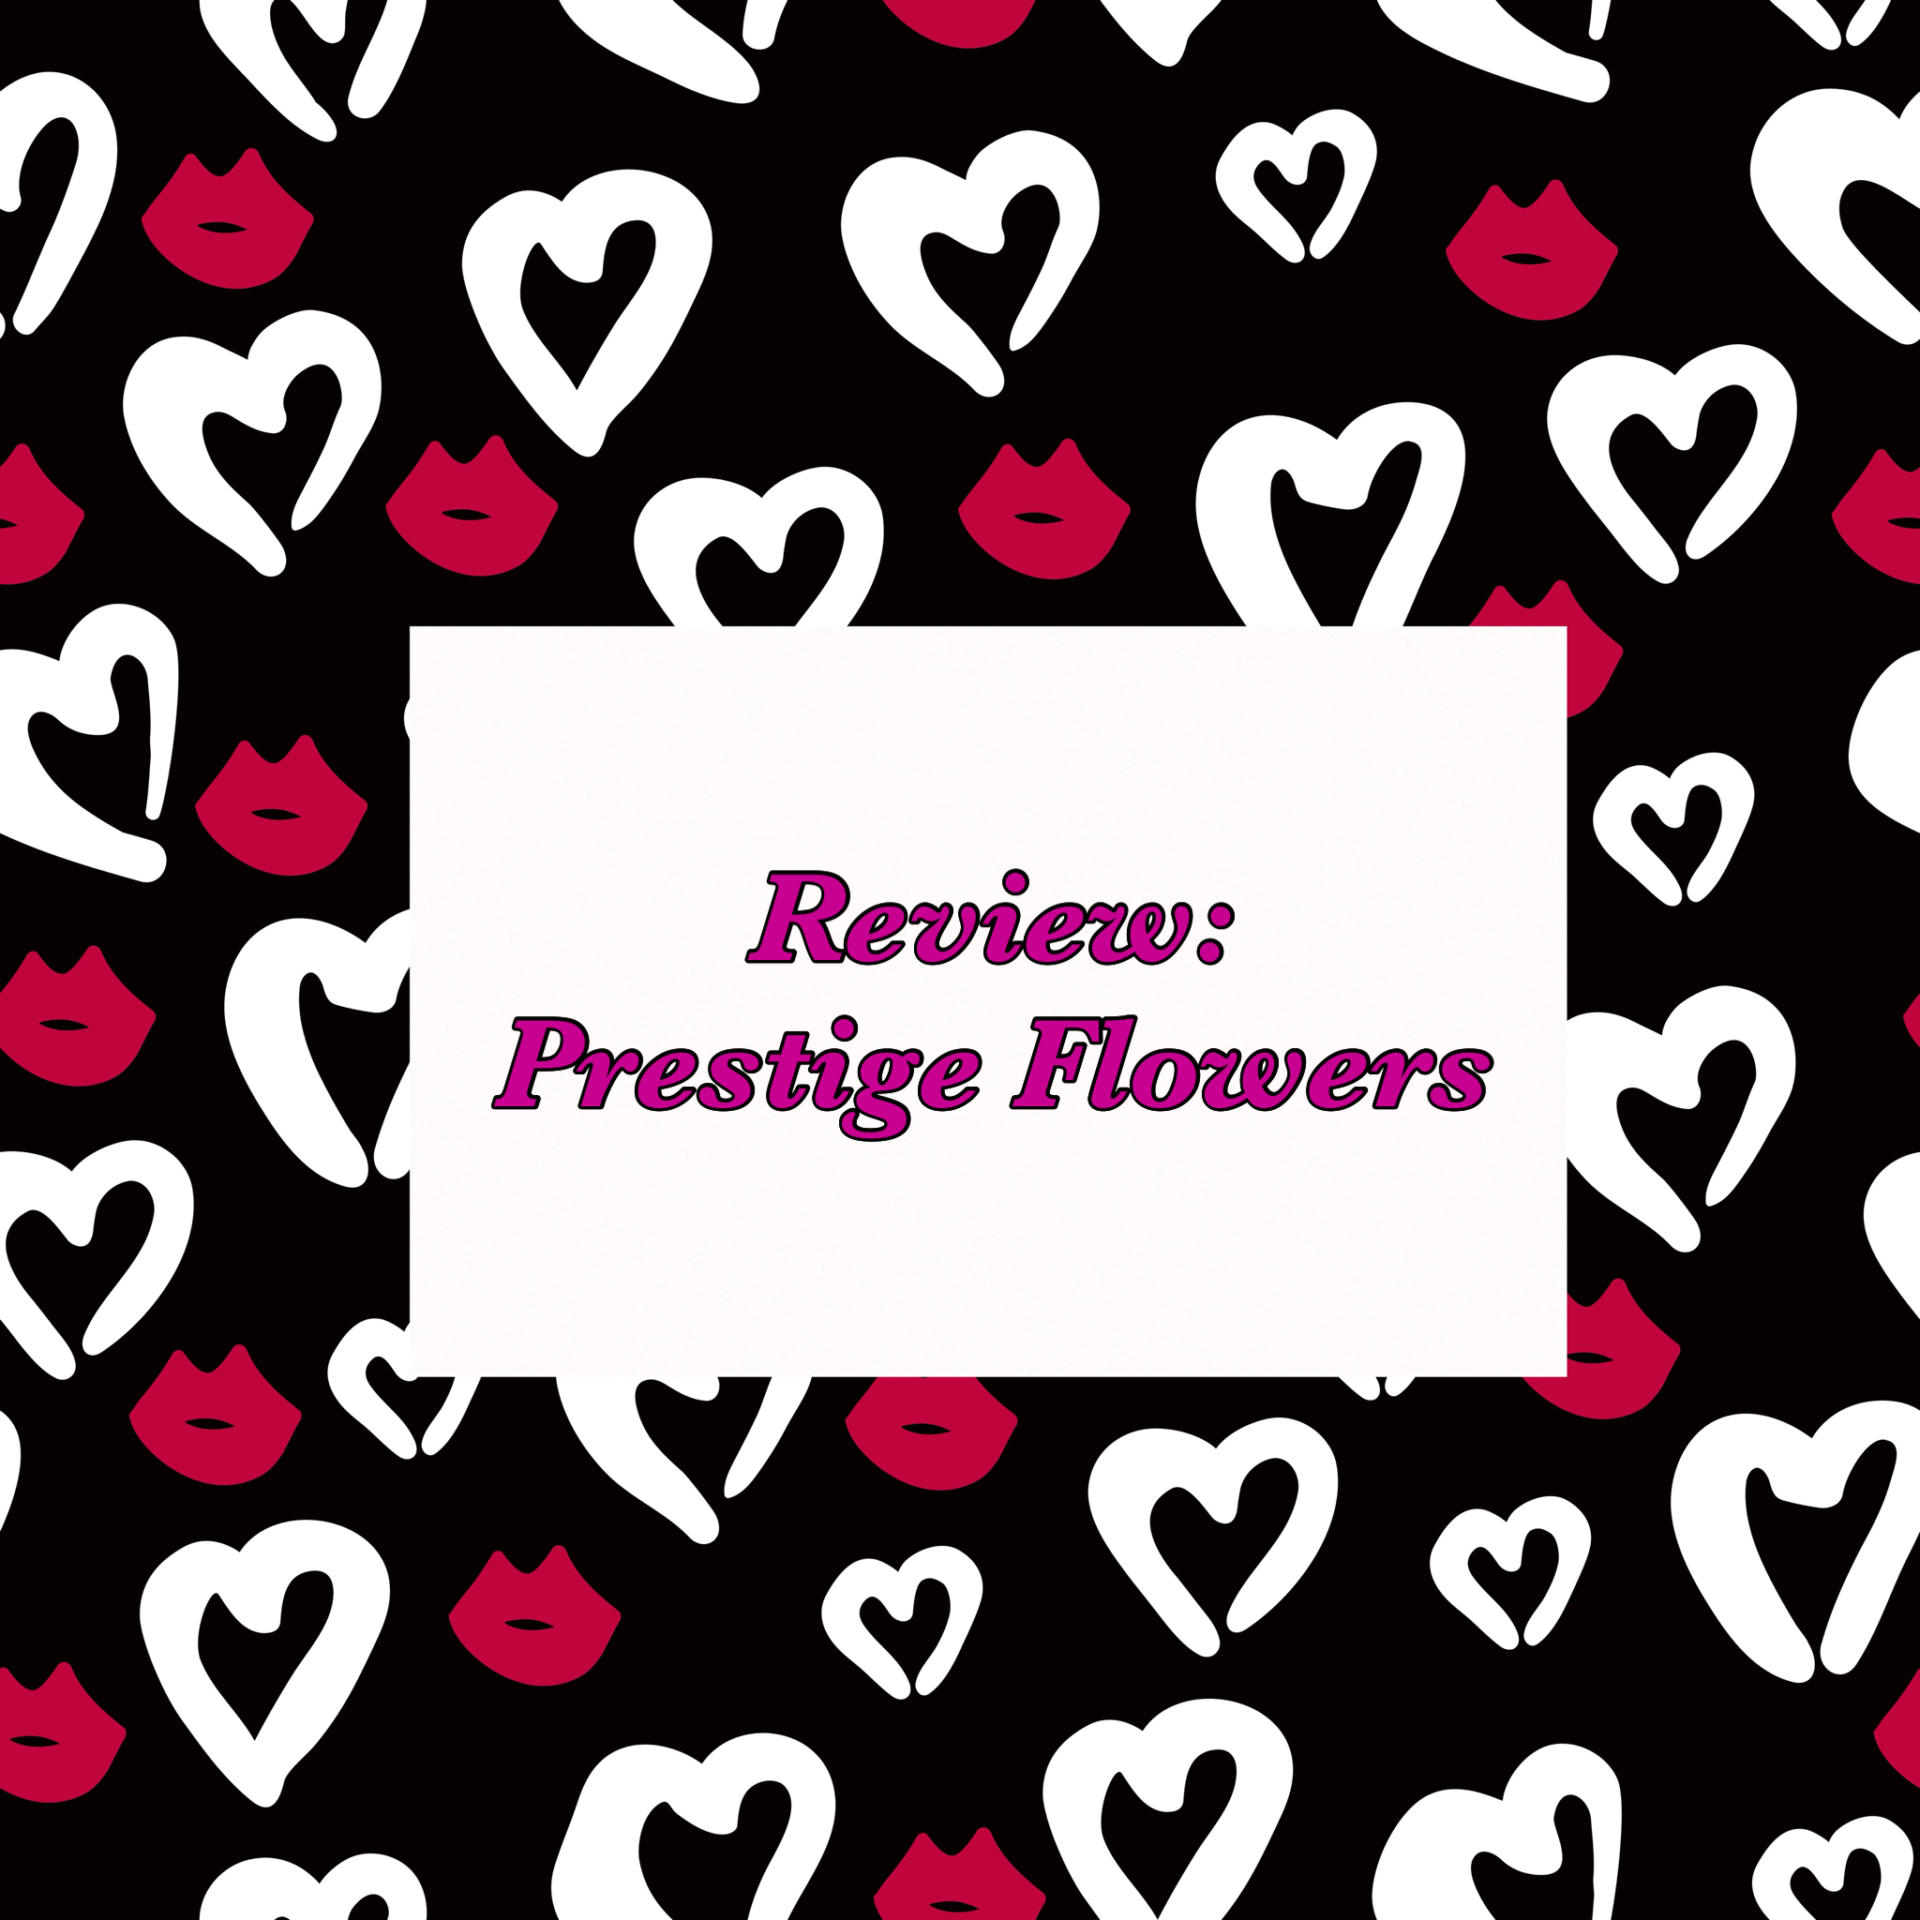 Review: Prestige Flowers